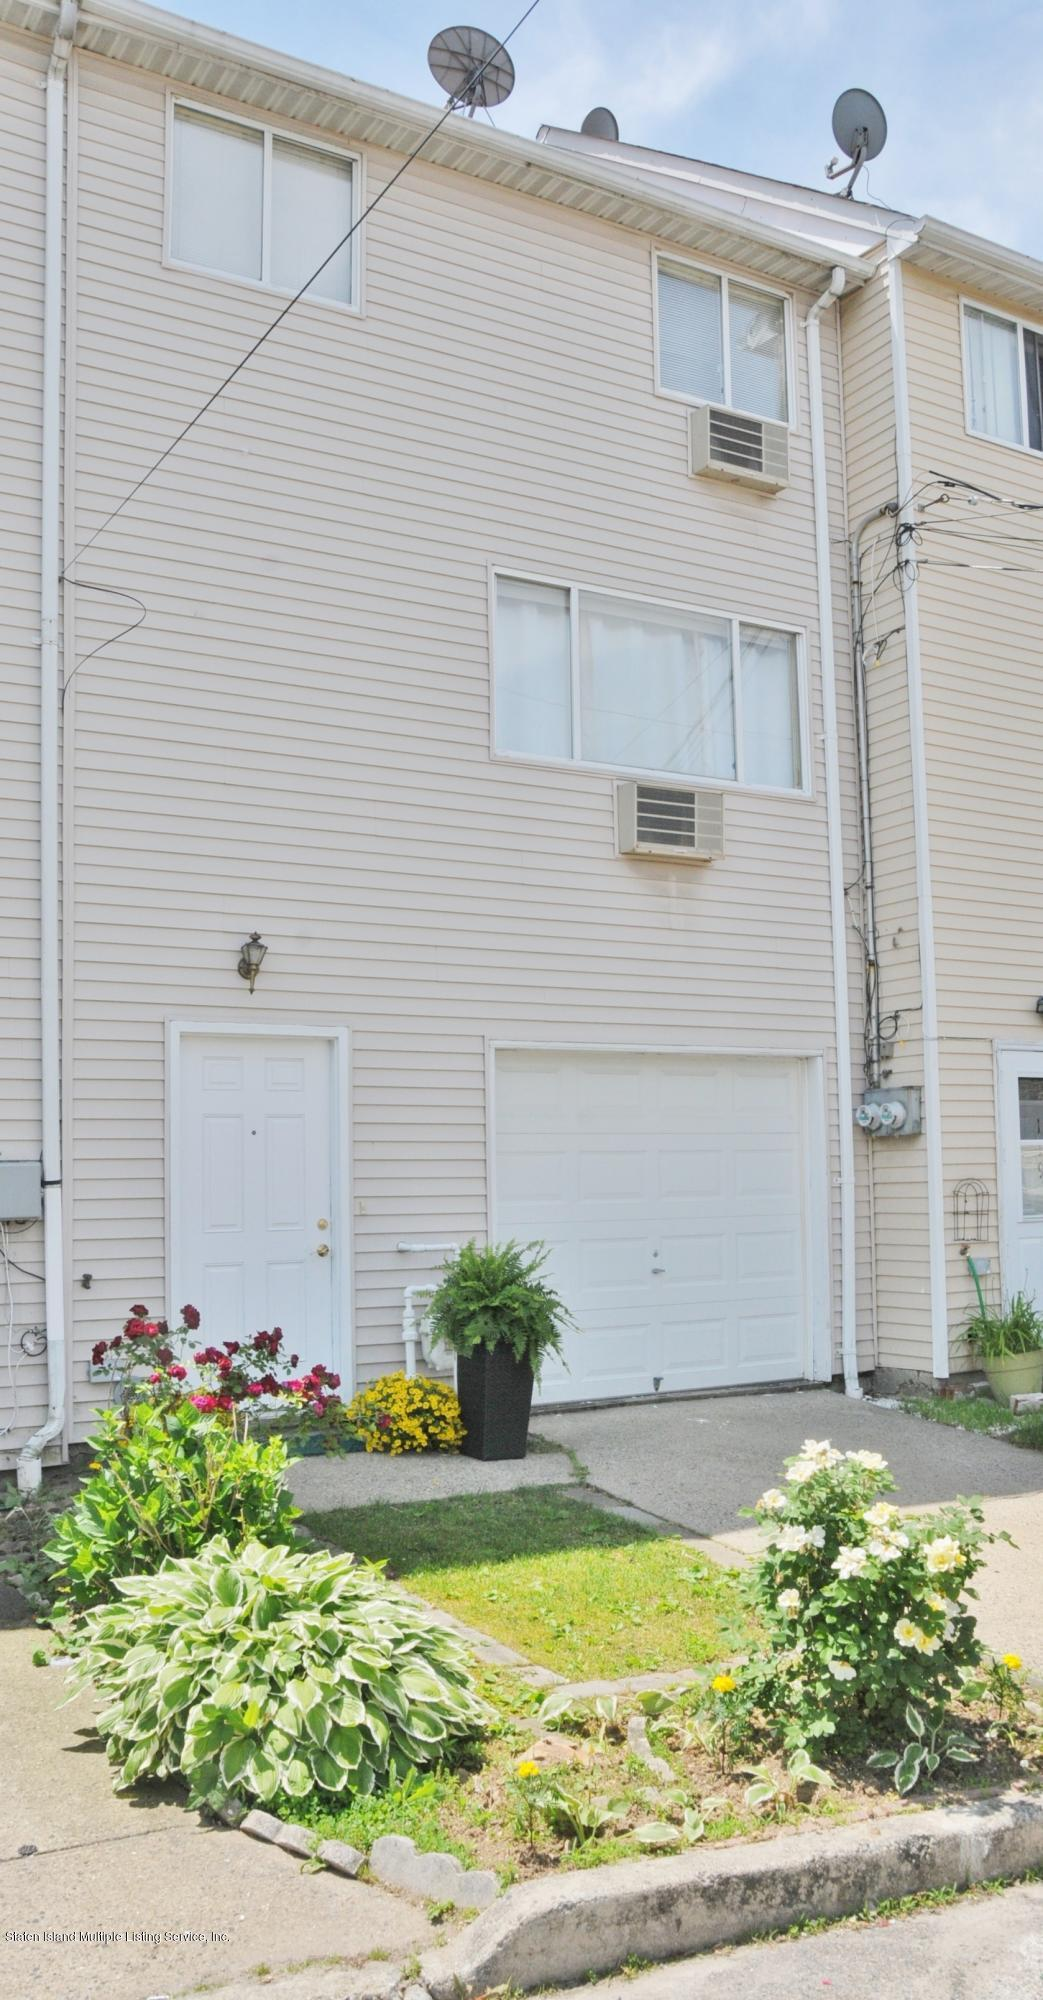 Single Family - Attached 117 Clark Lane  Staten Island, NY 10304, MLS-1129710-3